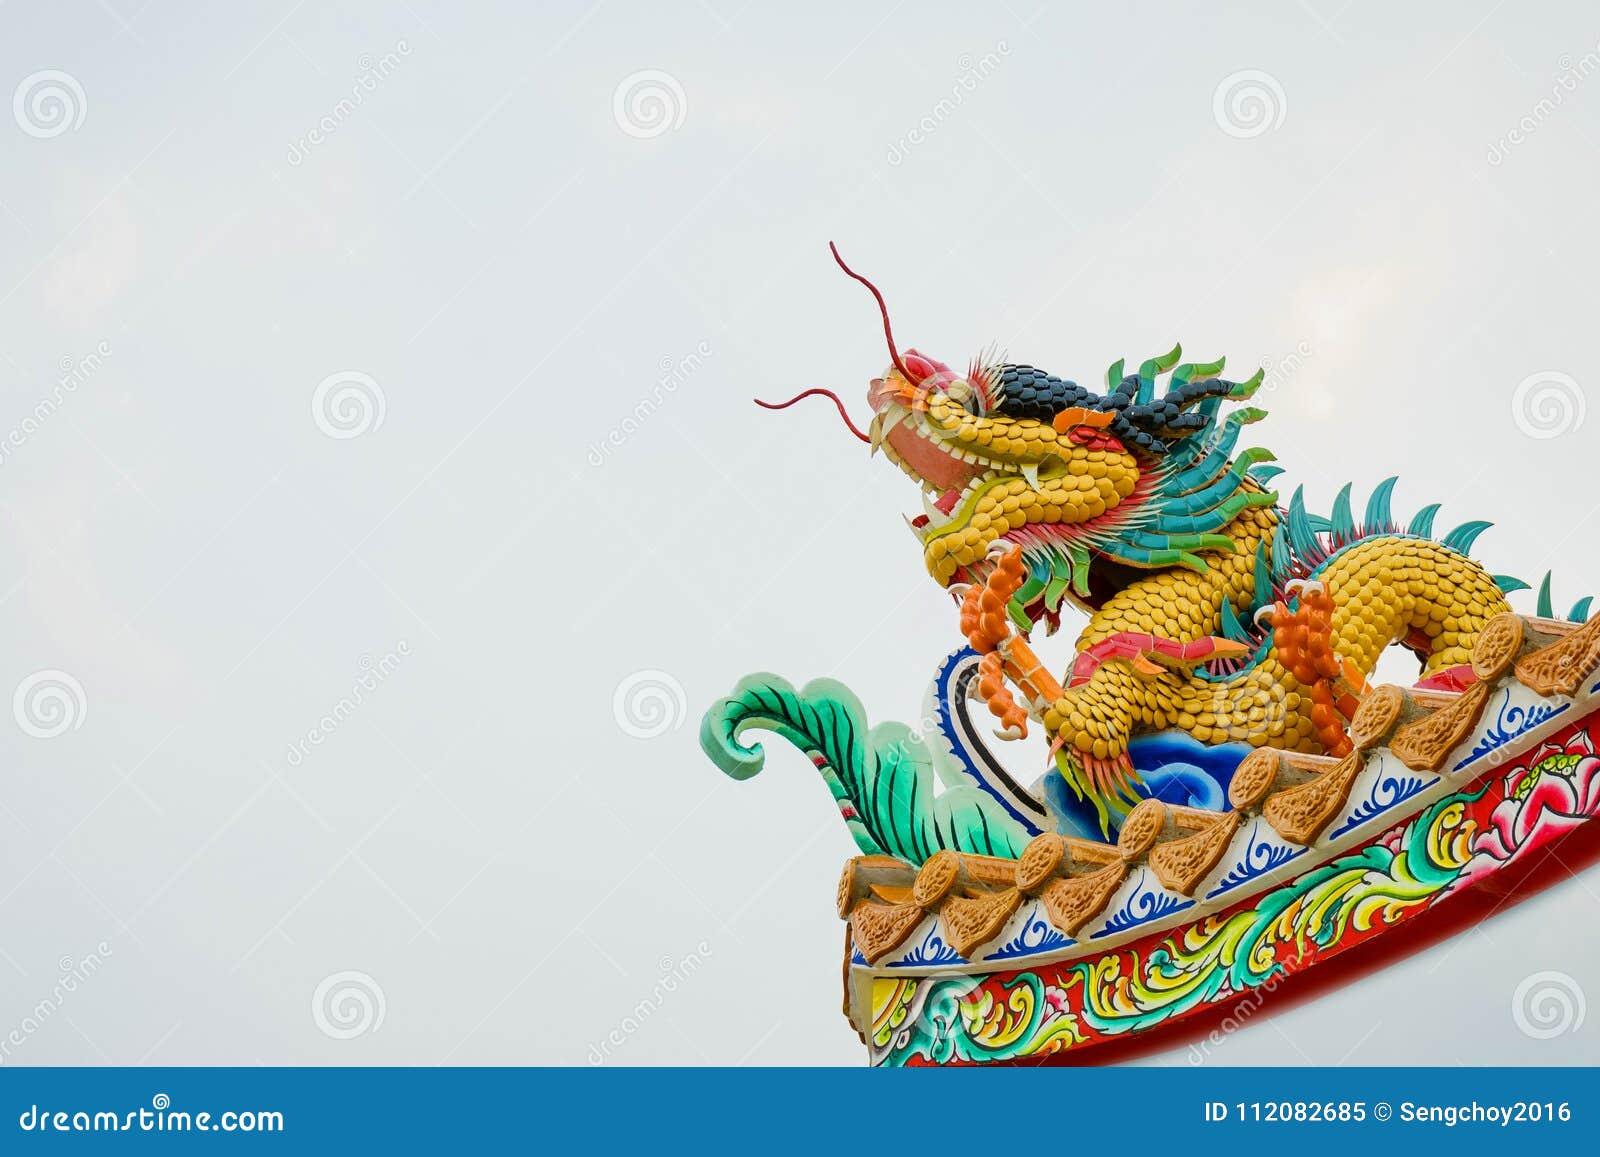 Taoism Symbols Dragon: Colorful Concrete Chinese Dragon Statue Stock Image